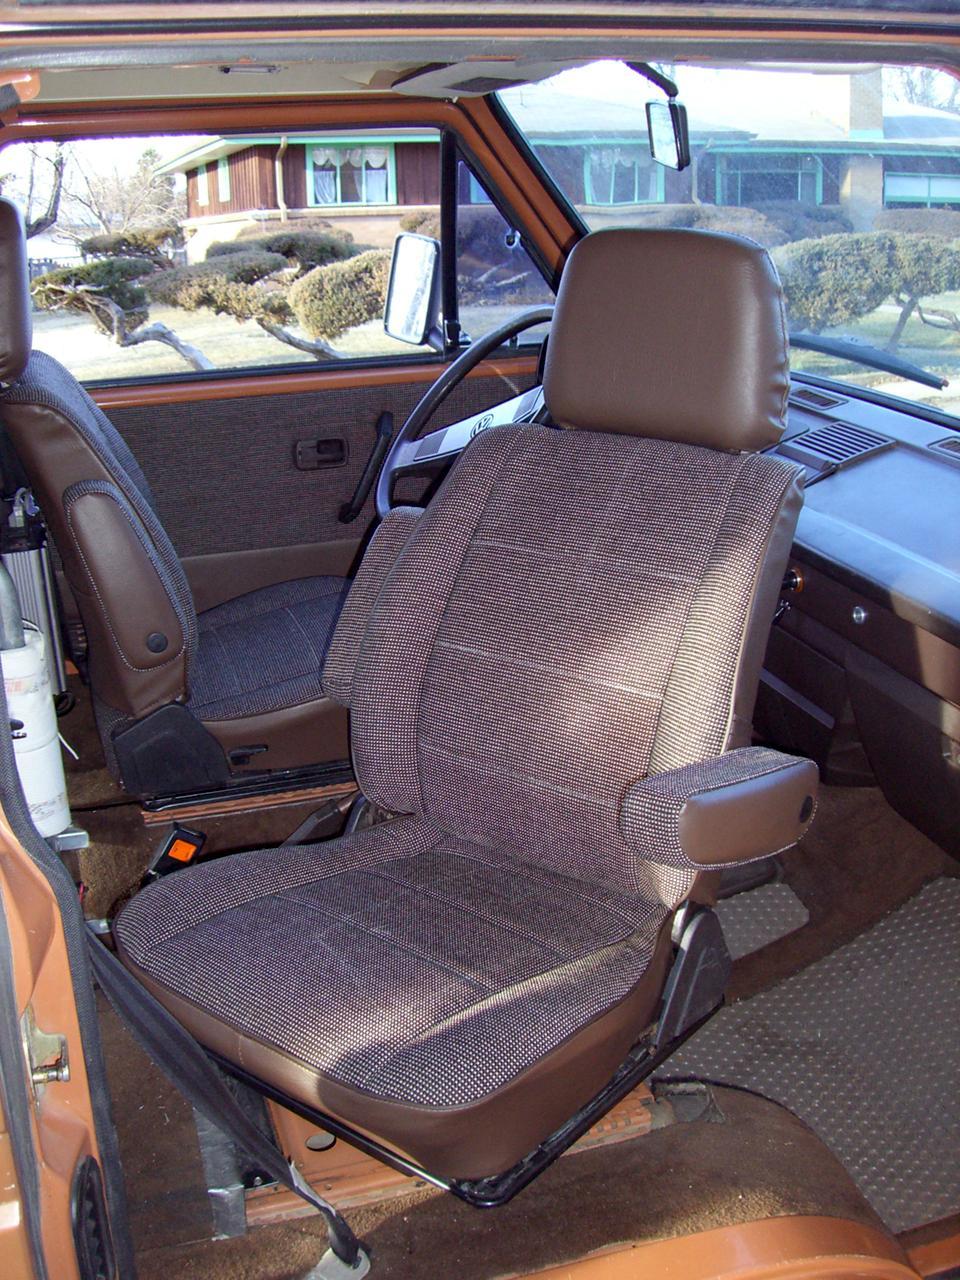 Vw Vanagon Seat Covers  U2013 Velcromag